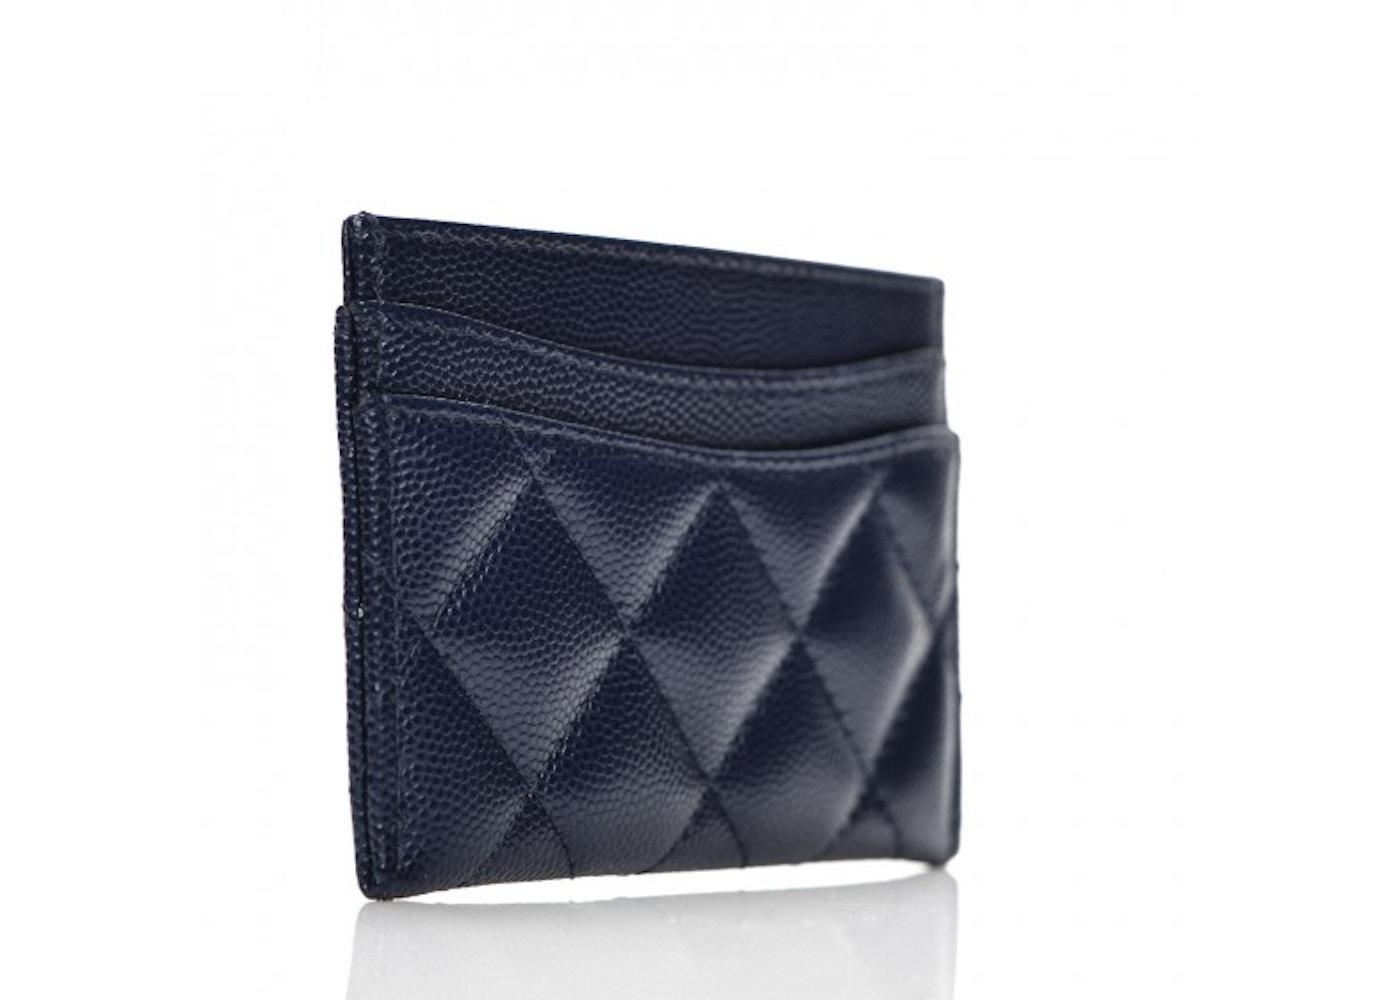 642f0f597333 Buy   Sell Chanel Luxury Handbags